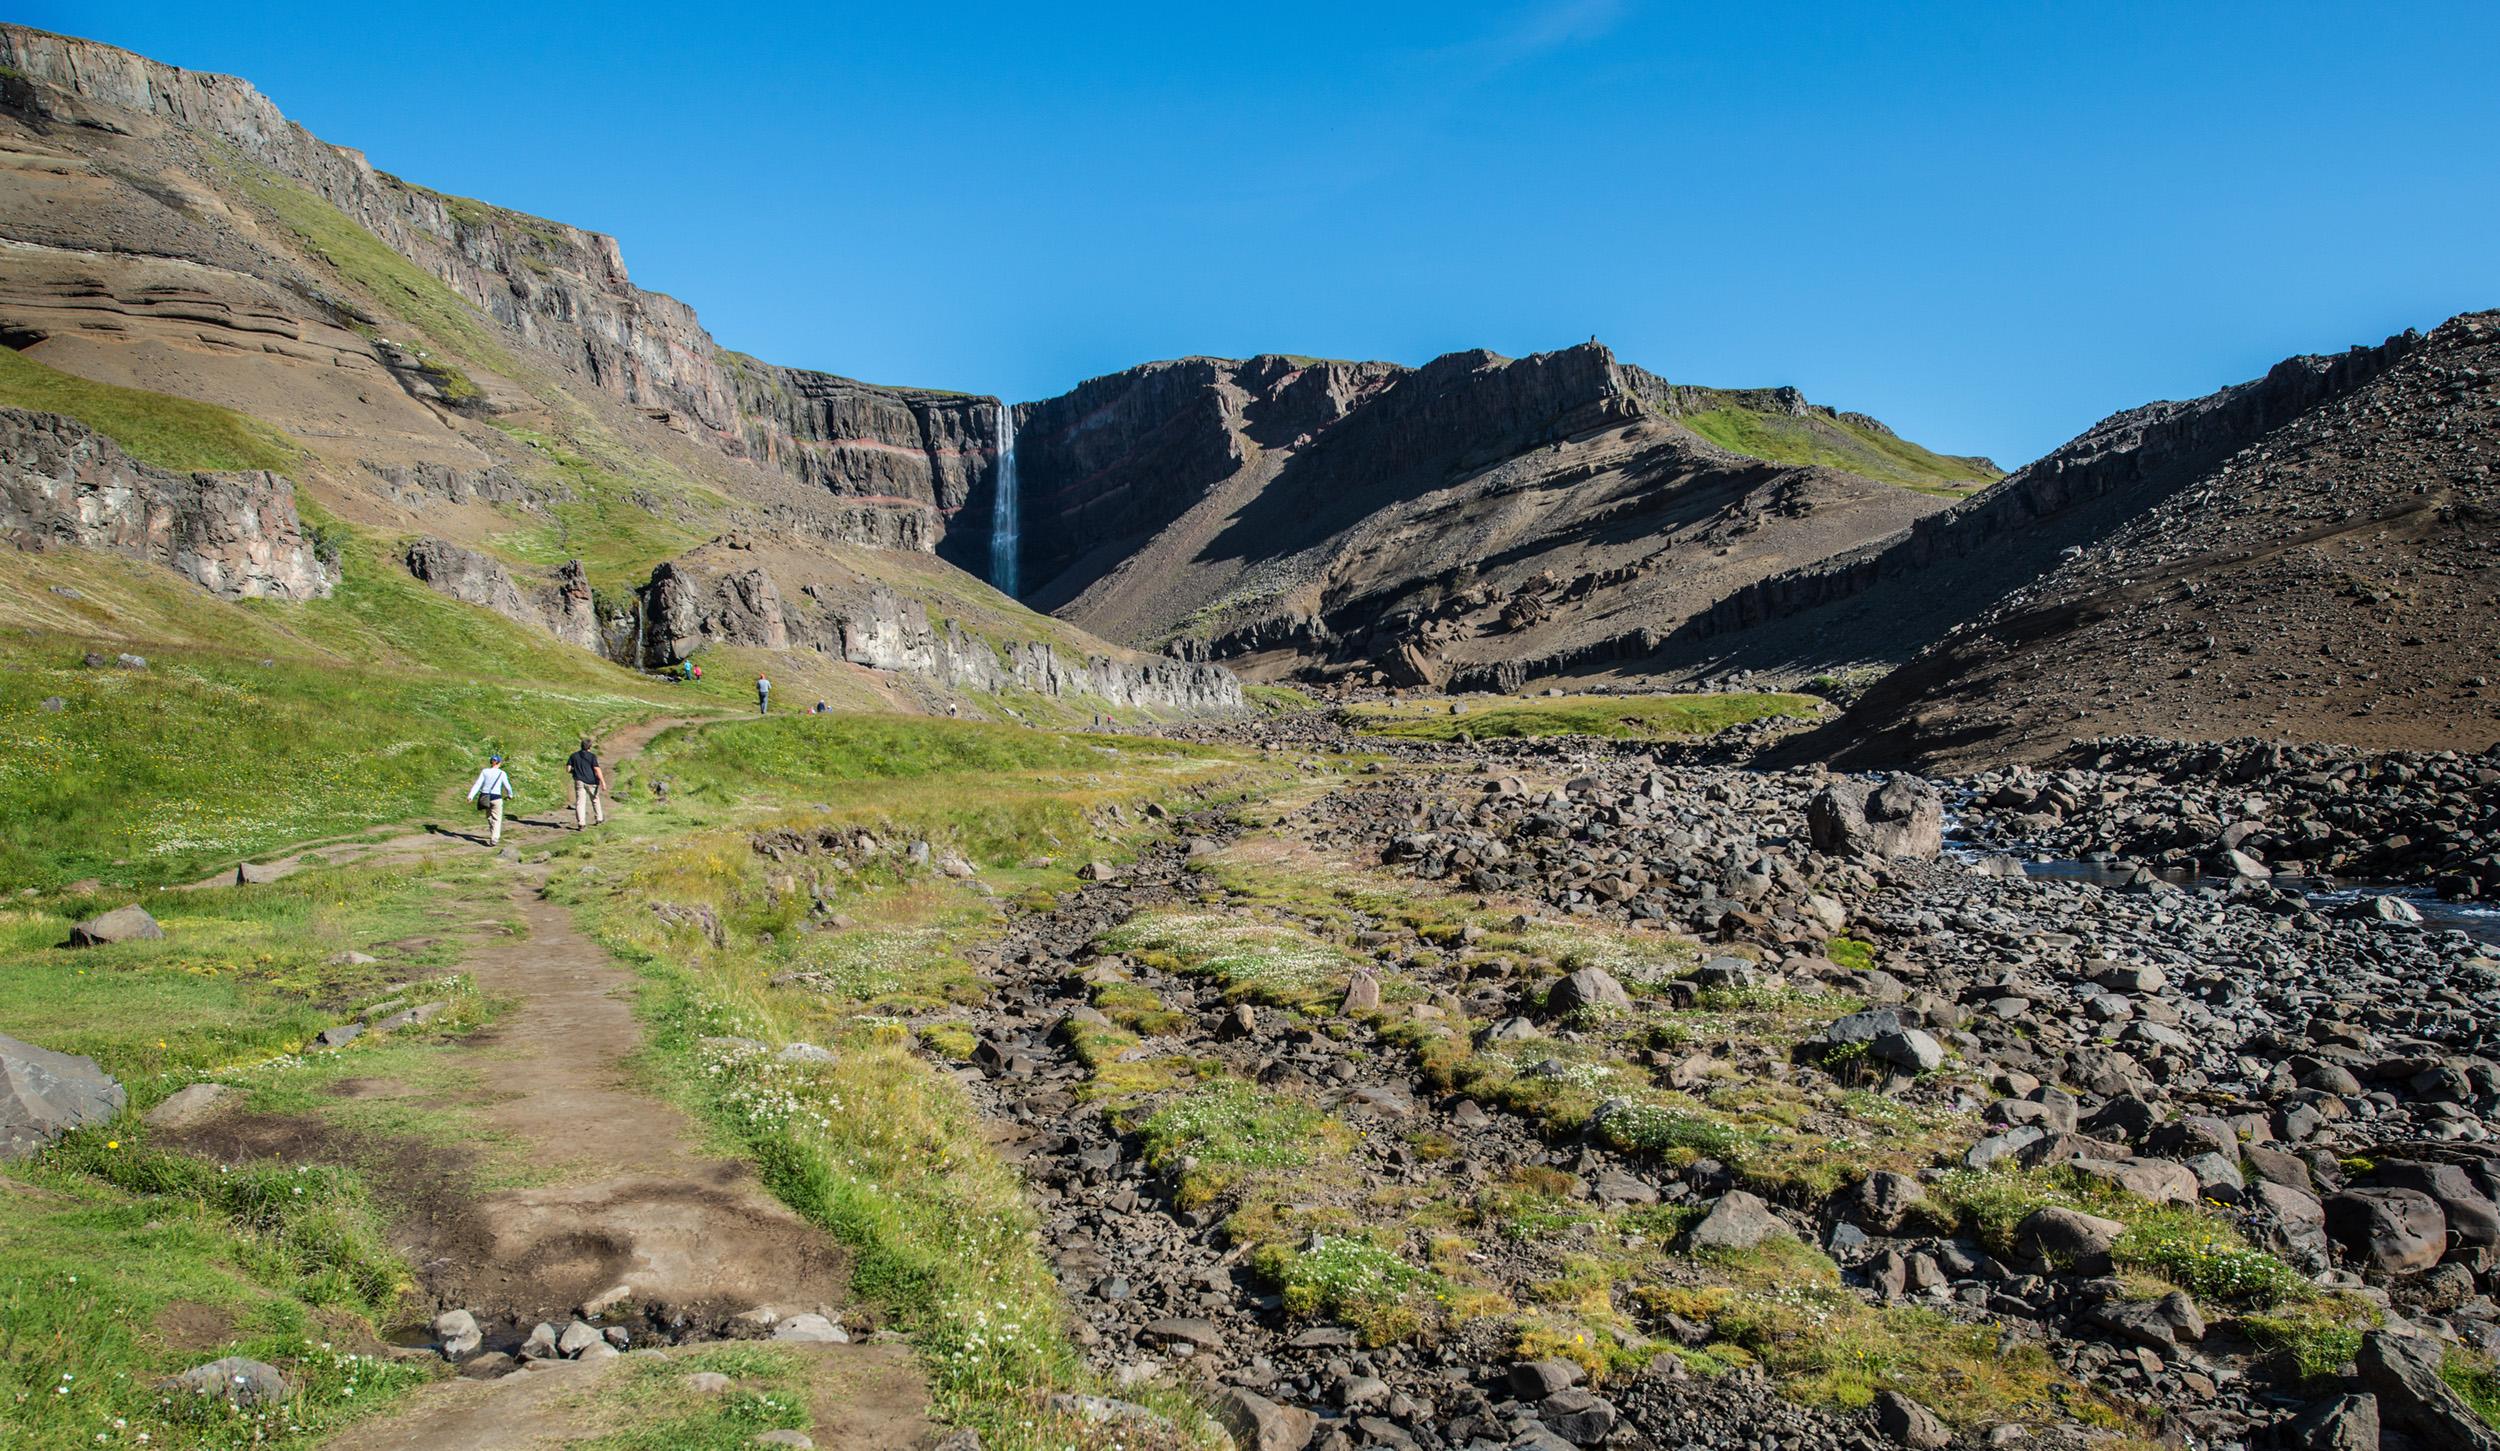 #waterfall, #iceland, #basalt, #volcanic, #hike, #leadinglines, #rock